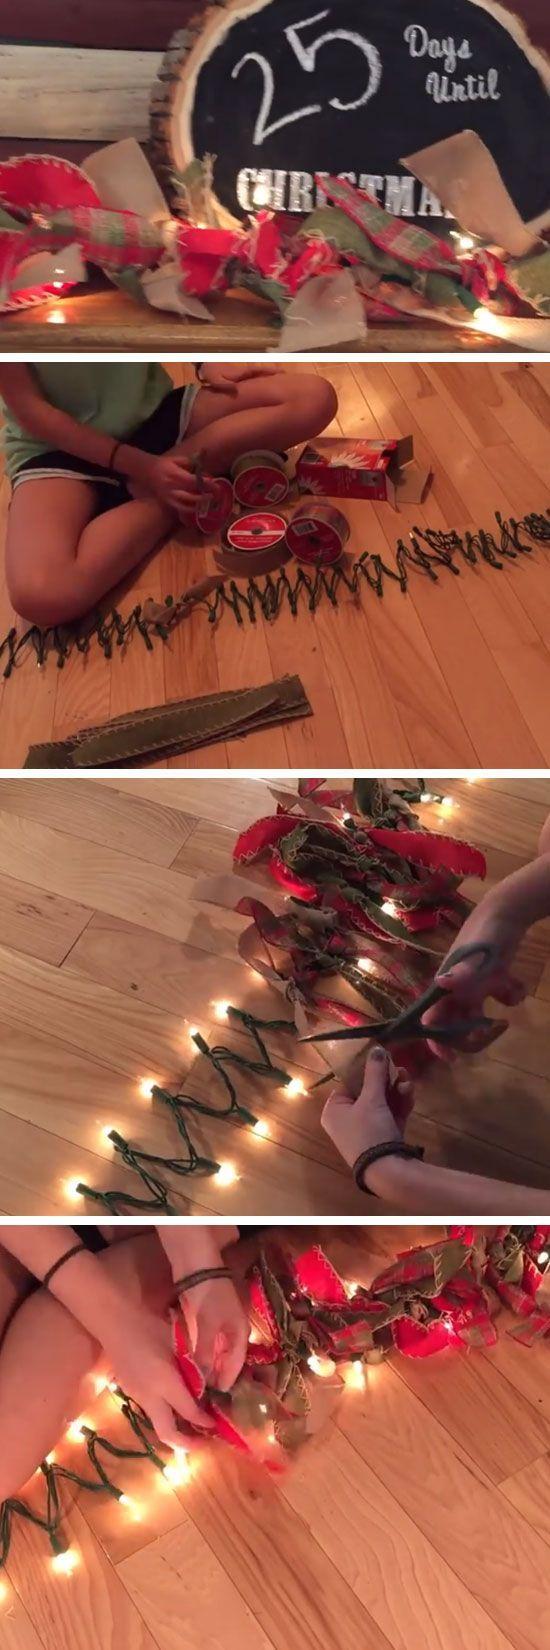 DIY Burlap Garland   DIY Rustic Christmas Decorations Cheap   Homemade Christmas Decor Ideas on a Budget